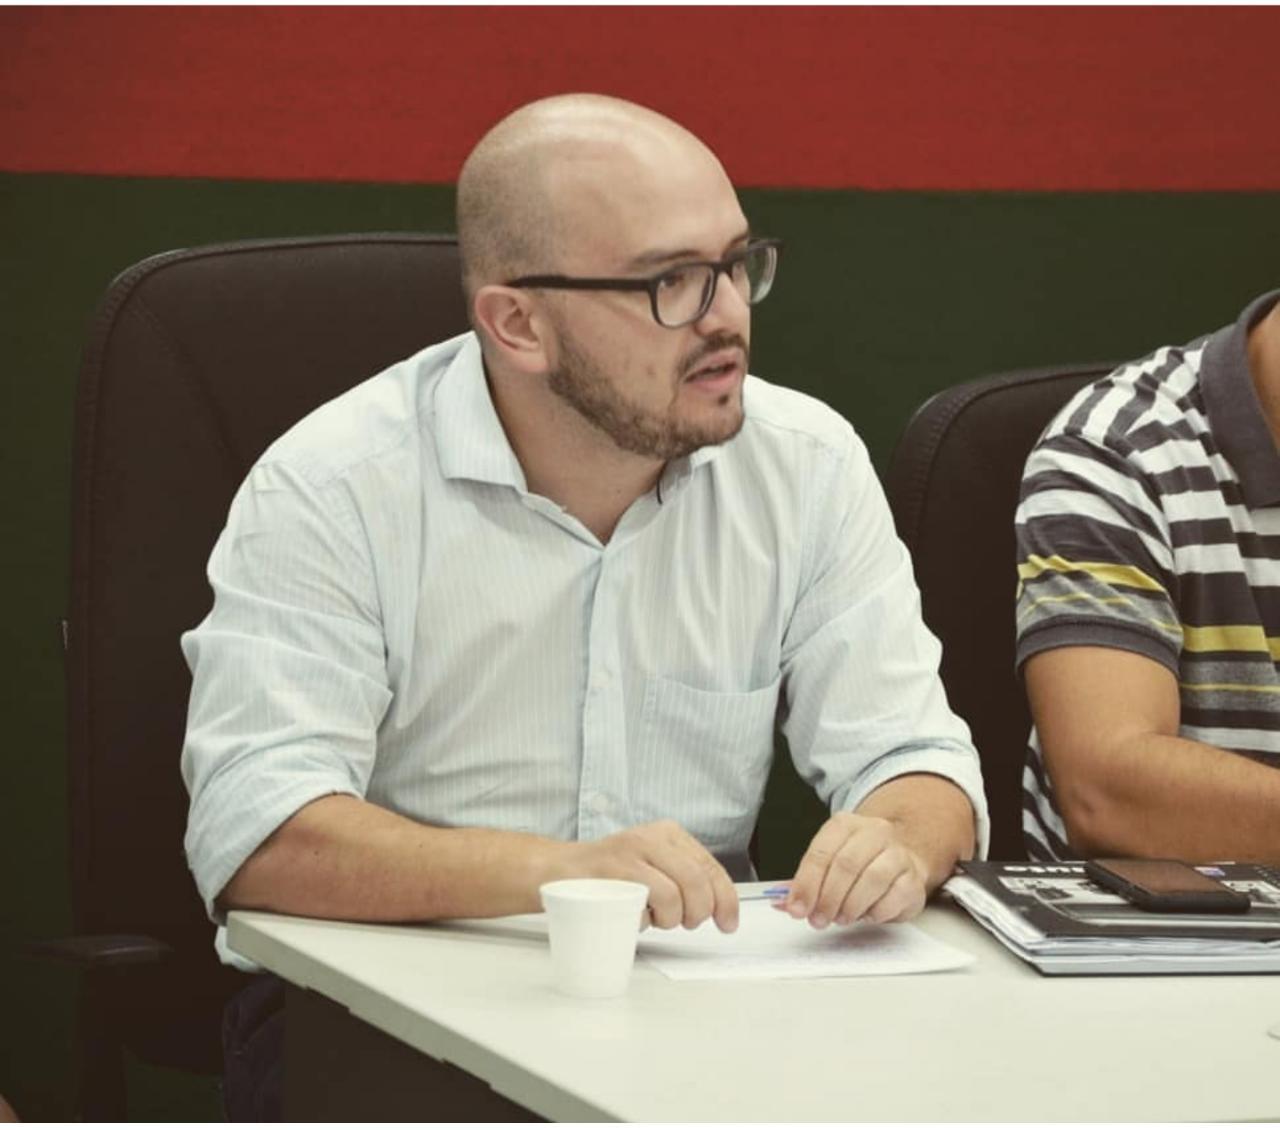 Coordenadoria Municipal da Juventude de Criciúma lança 'Motiva Jovem'